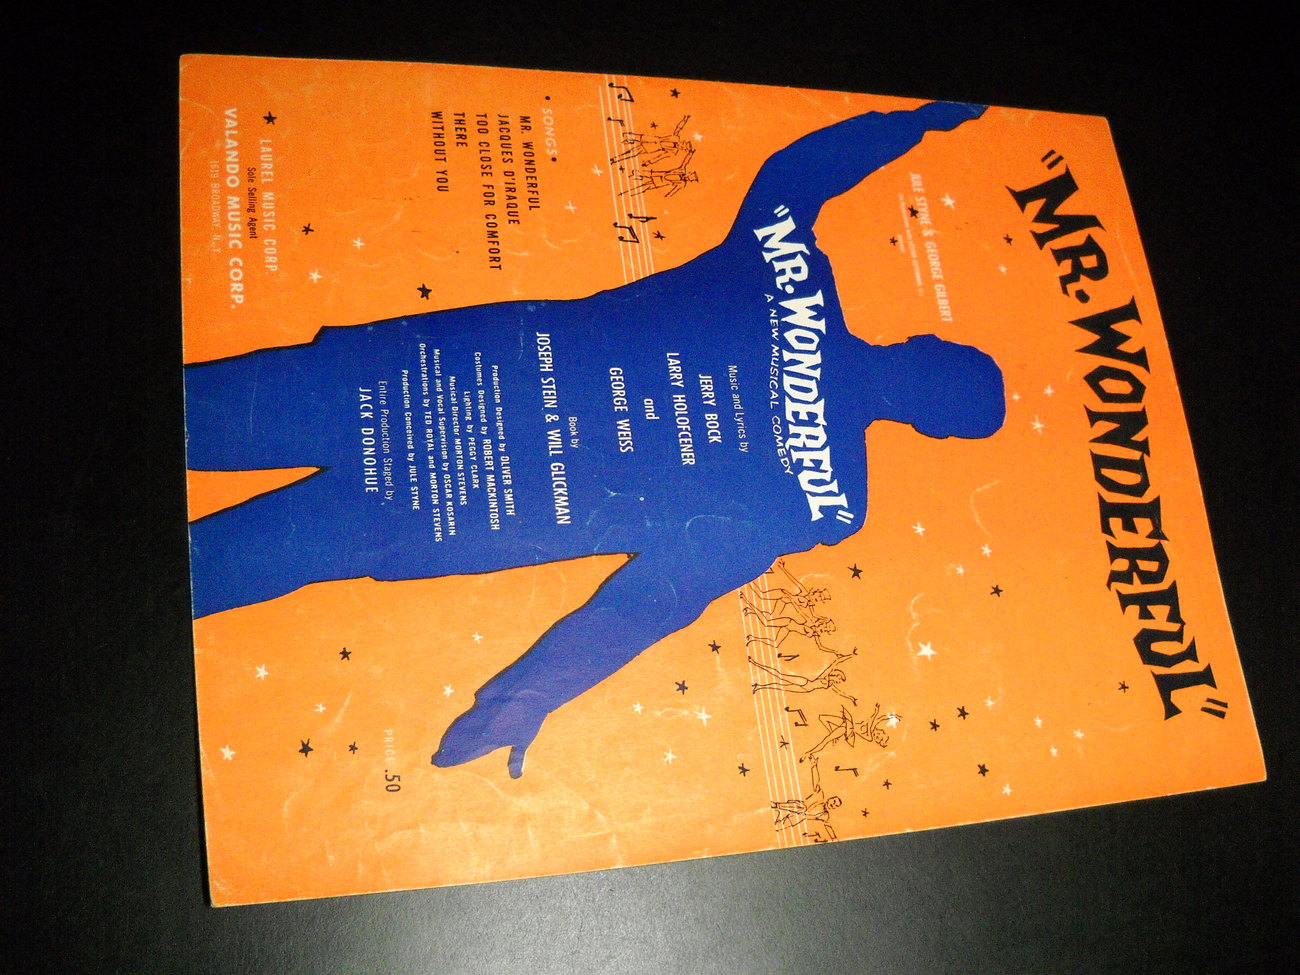 Sheet_music_mr_wonderful_1956_laurel_valando_music_01